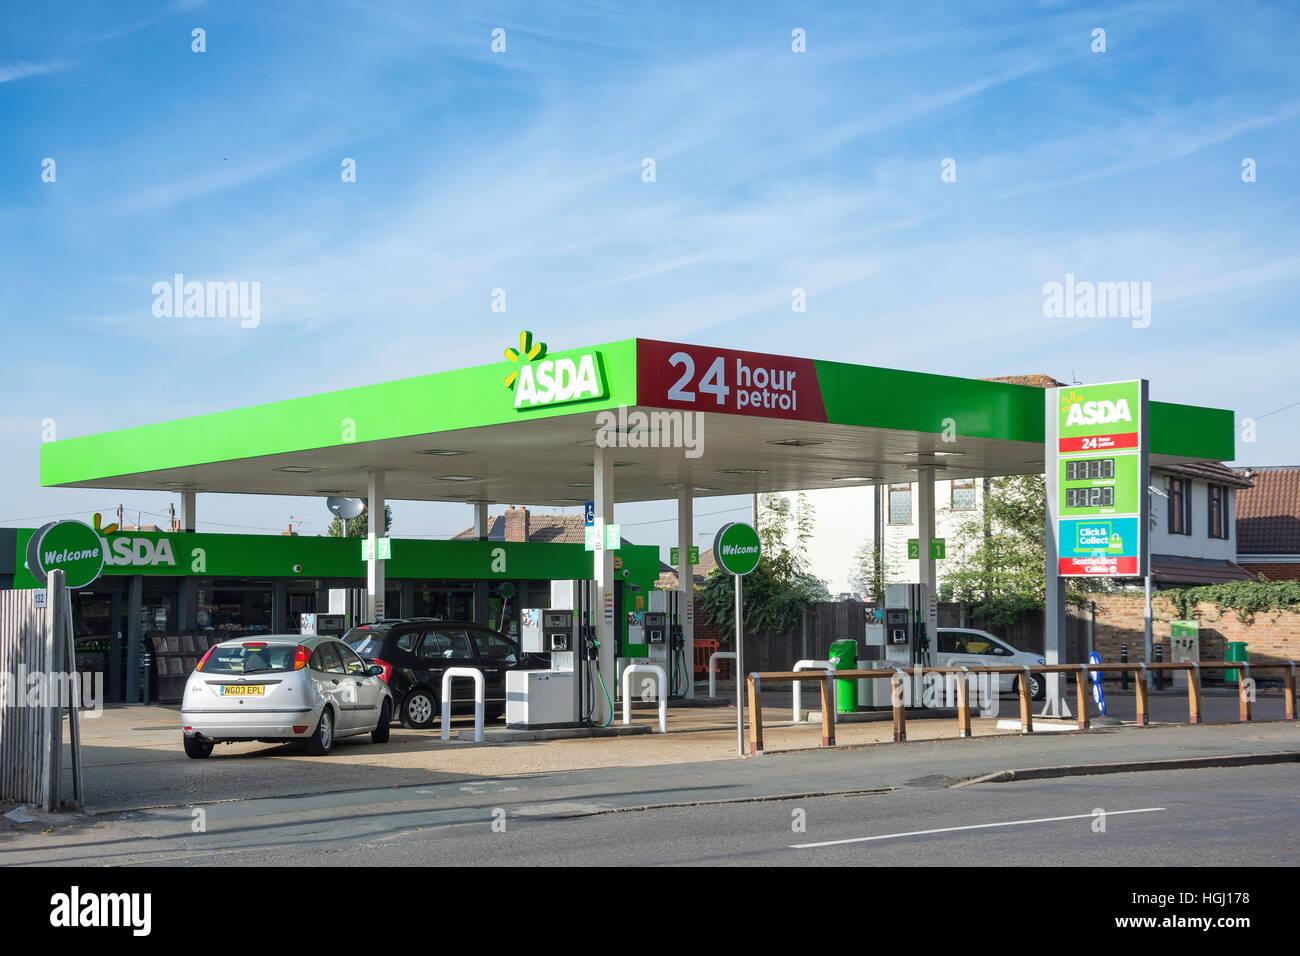 ASDA 24 hour petrol station, Chertsey Lane, Egham Hythe, Surrey, England, United Kingdom - Stock Image